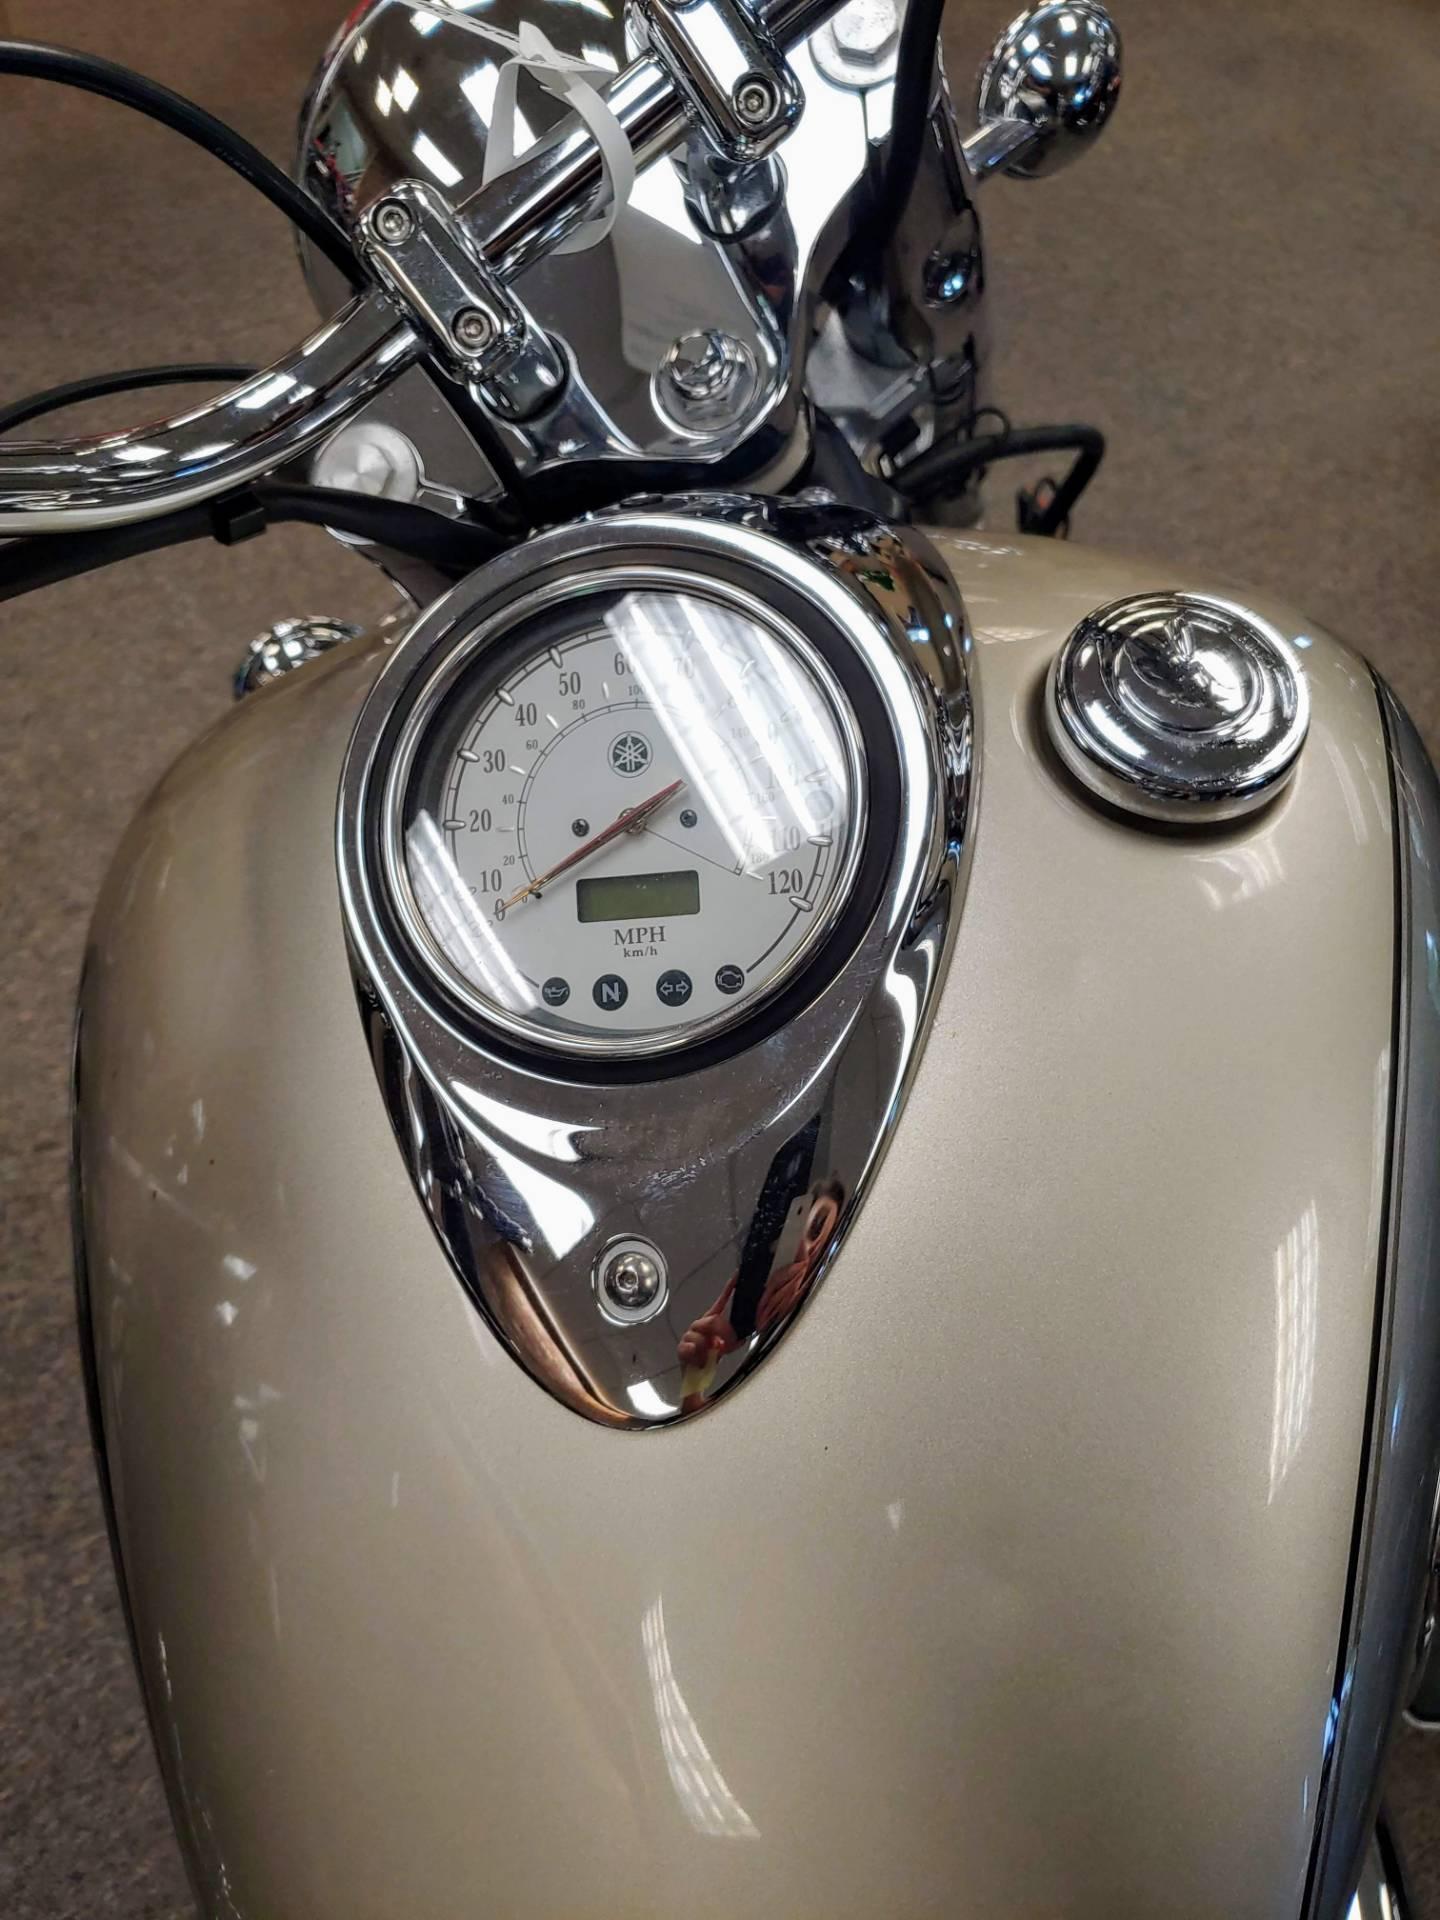 2006 Yamaha V Star® 1100 Silverado® in Statesville, North Carolina